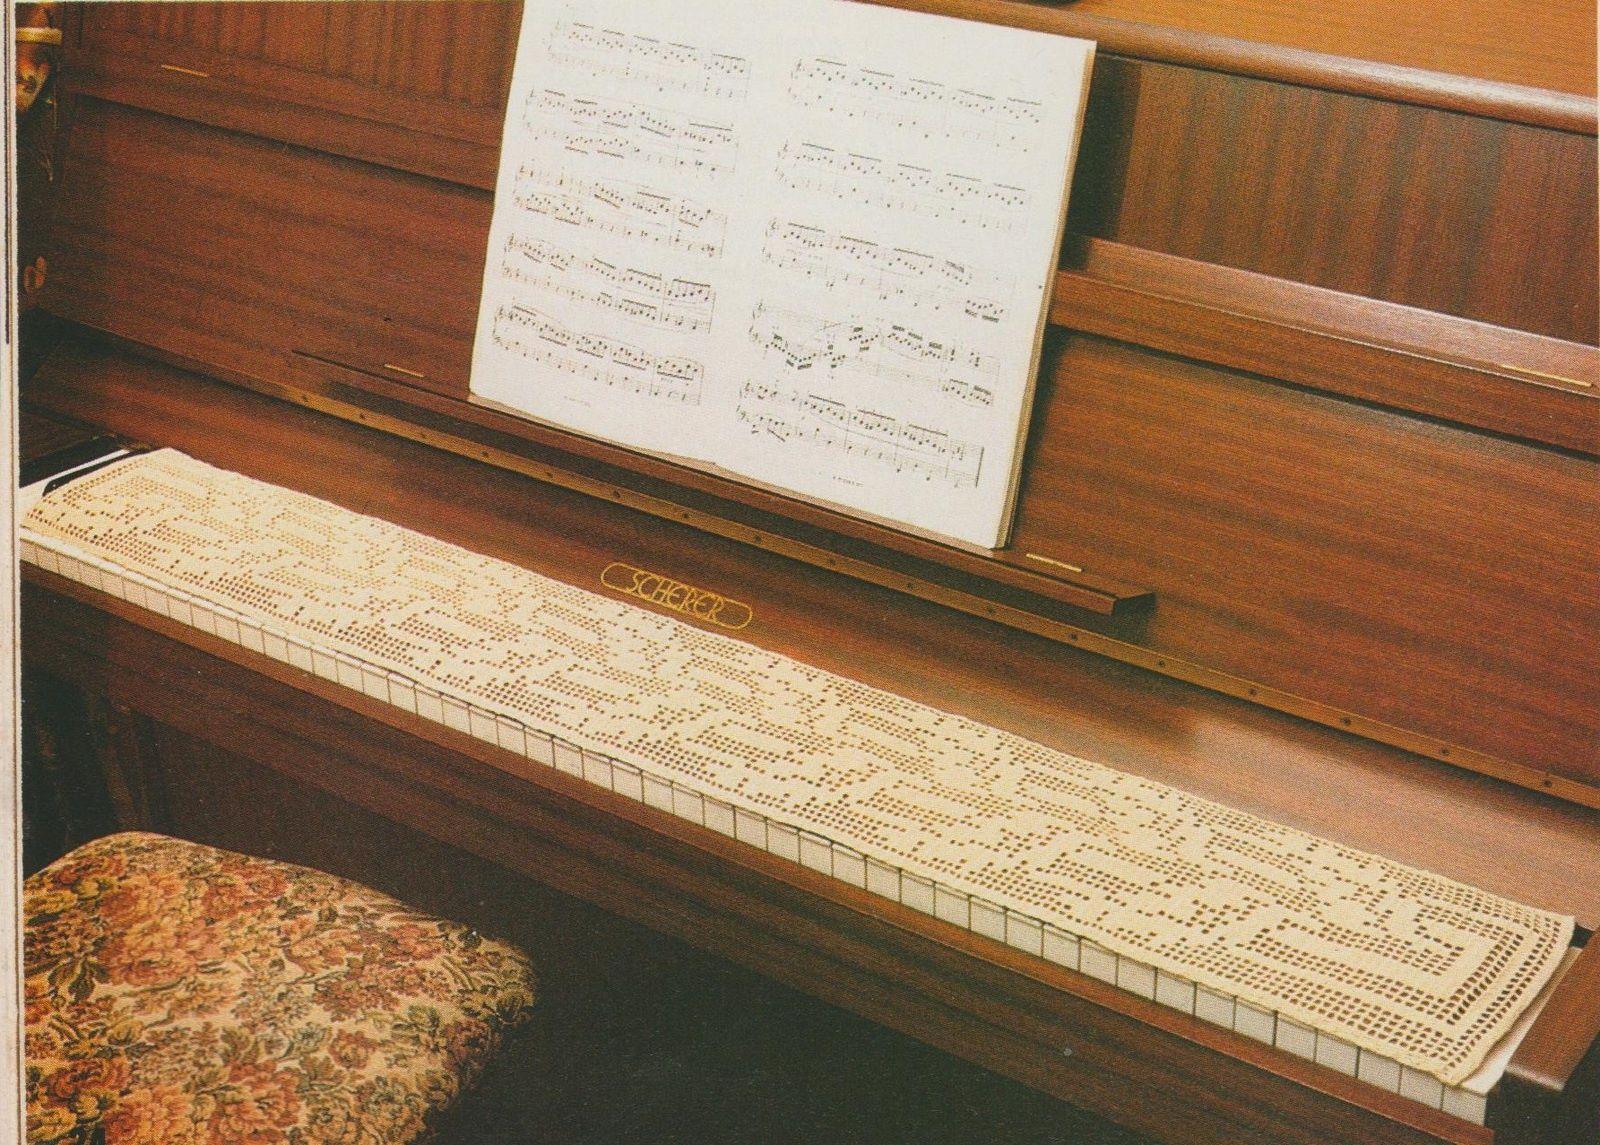 Crochet Protege Clavier De Piano Tutoriel Gratuit Clavier De Piano Tutoriel Piano